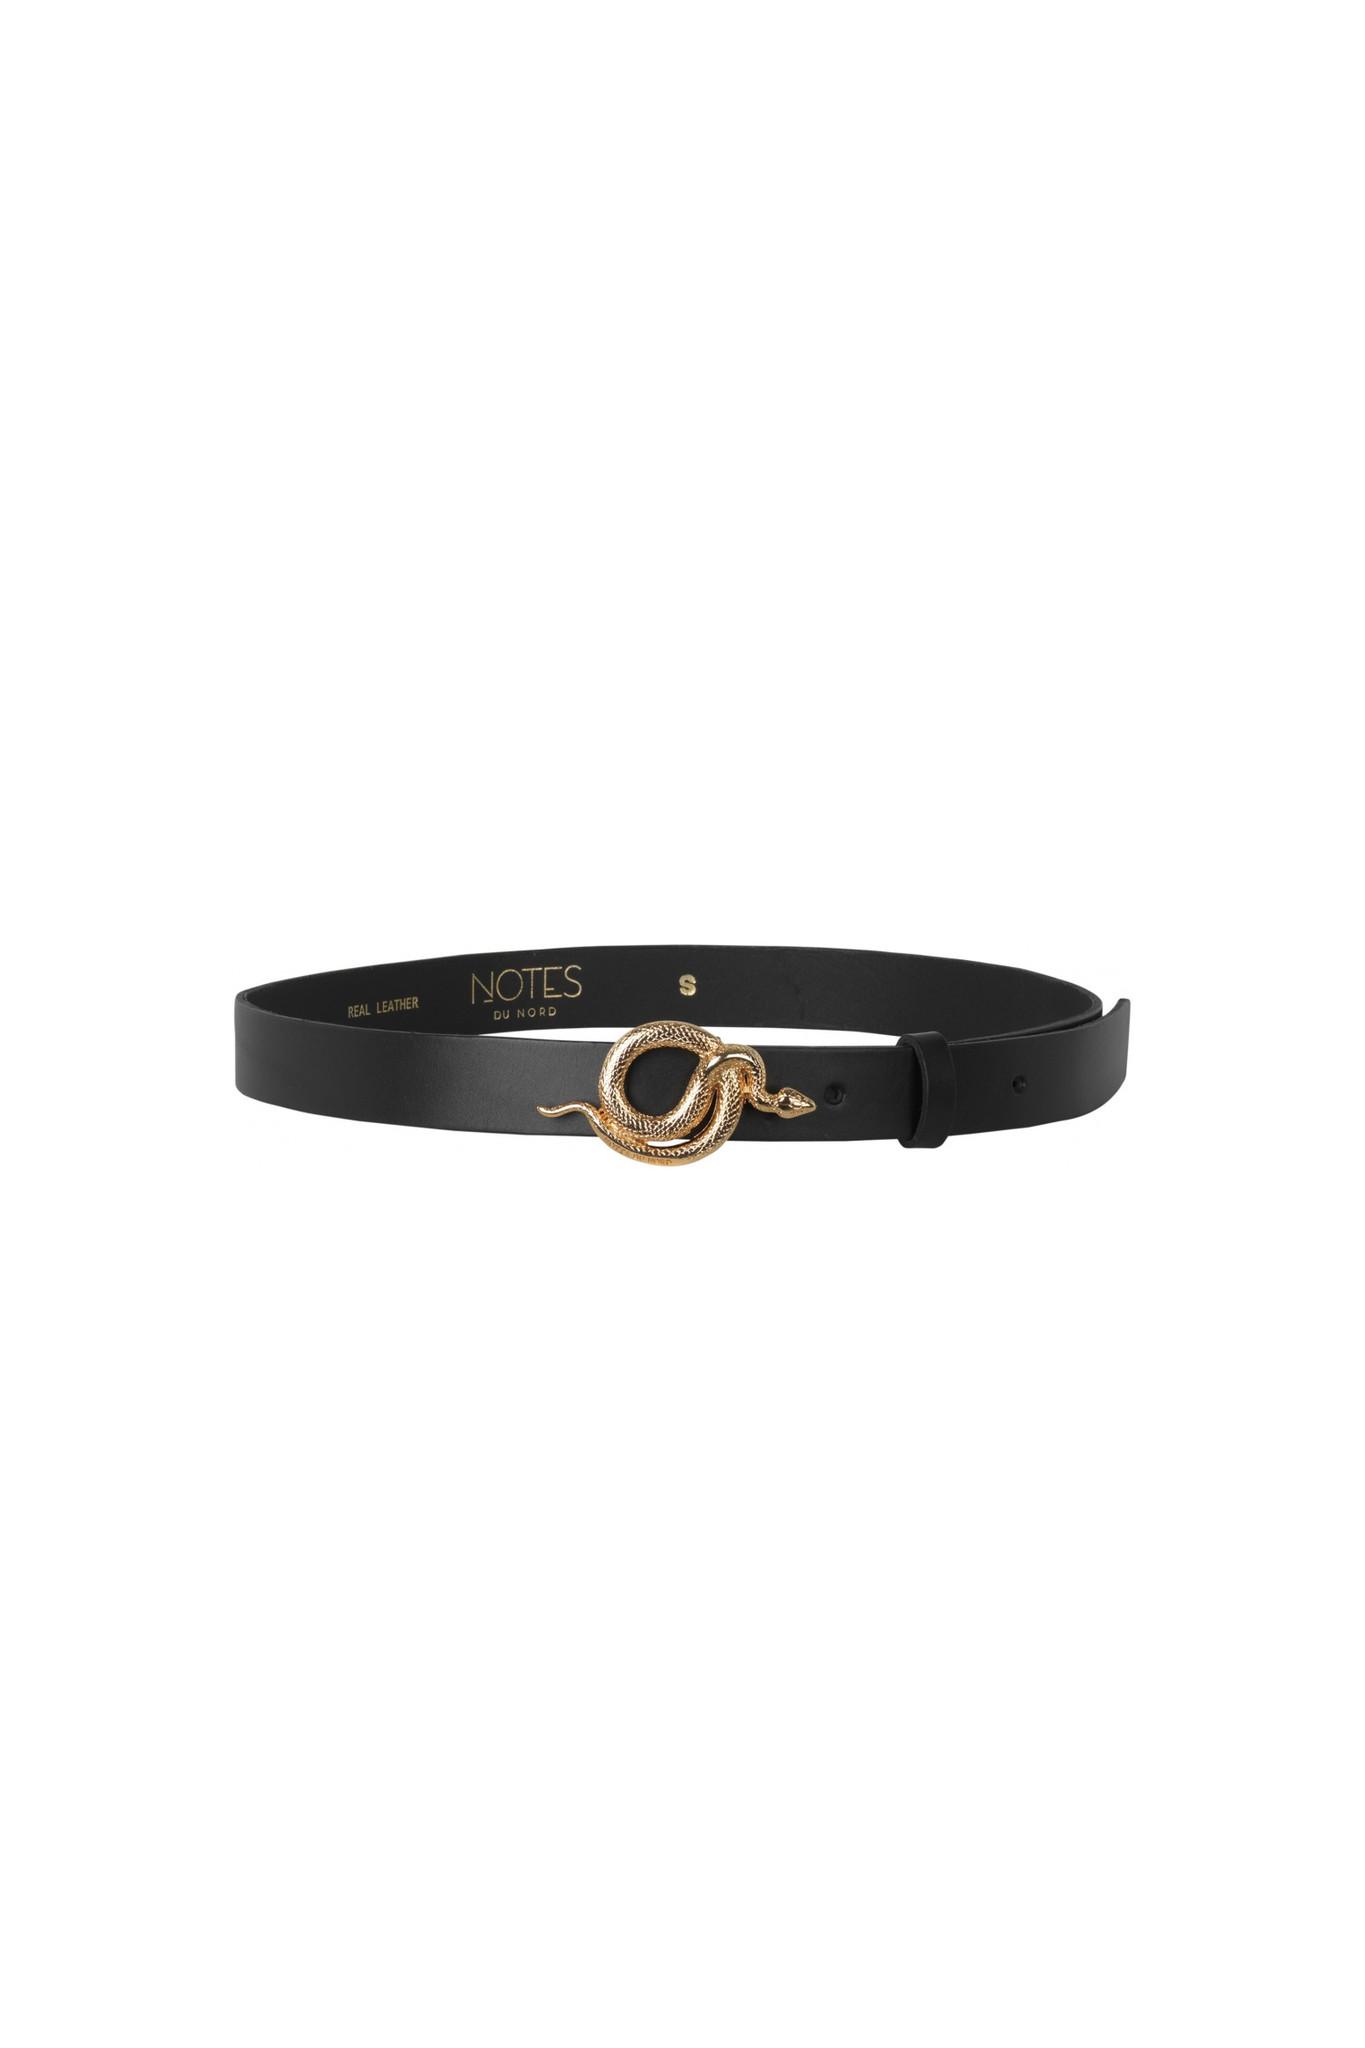 Paxton Leather Belt - Black / Gold-1